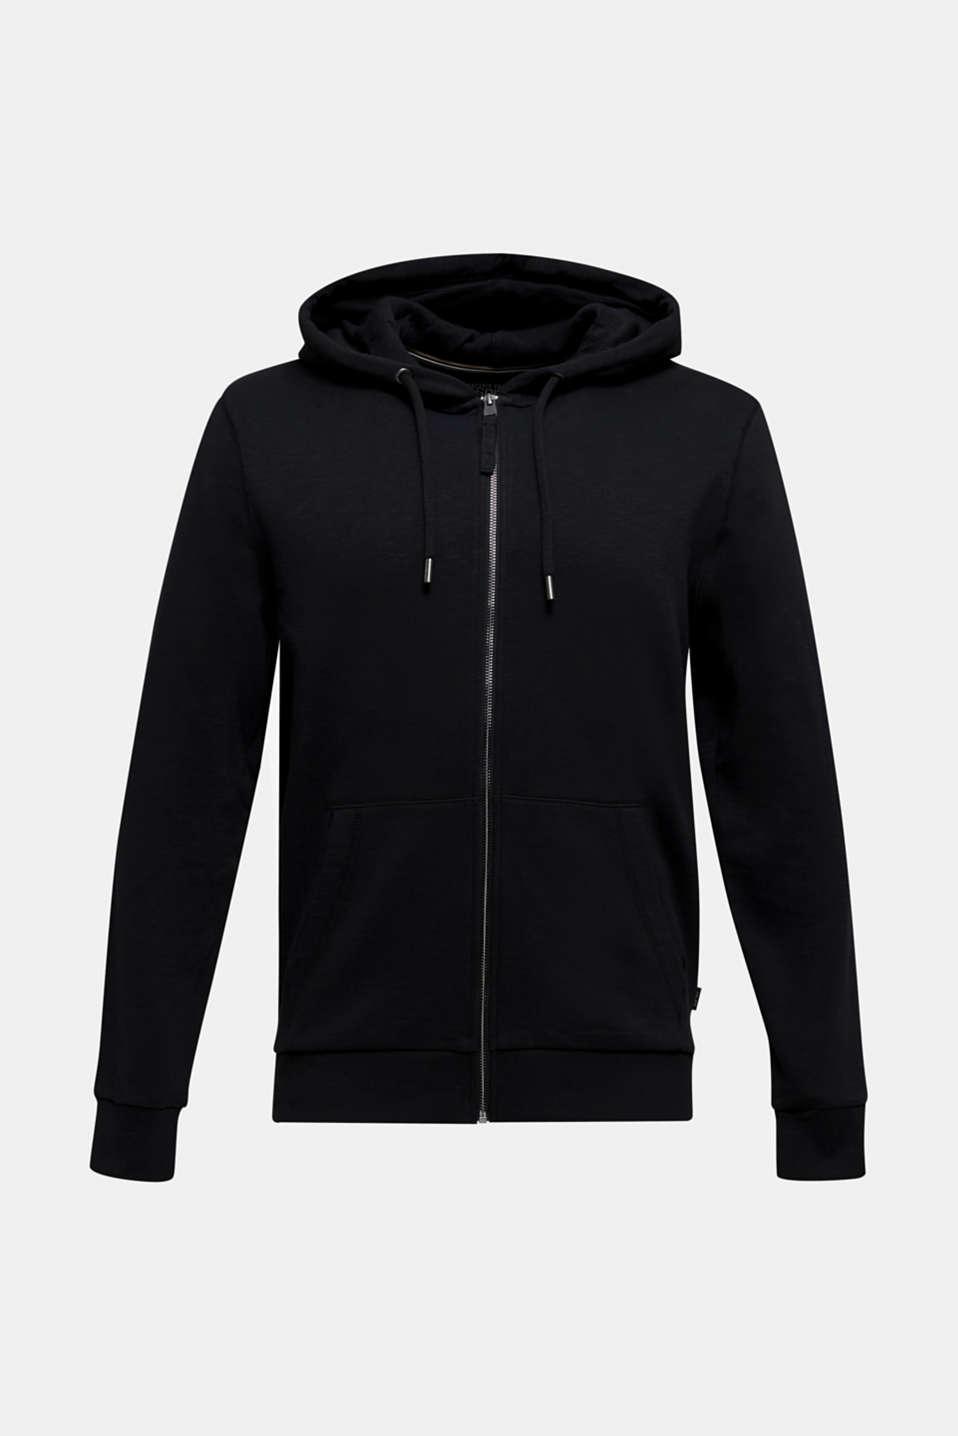 Sweatshirt cardigan with hood, 100% cotton, BLACK, detail image number 6